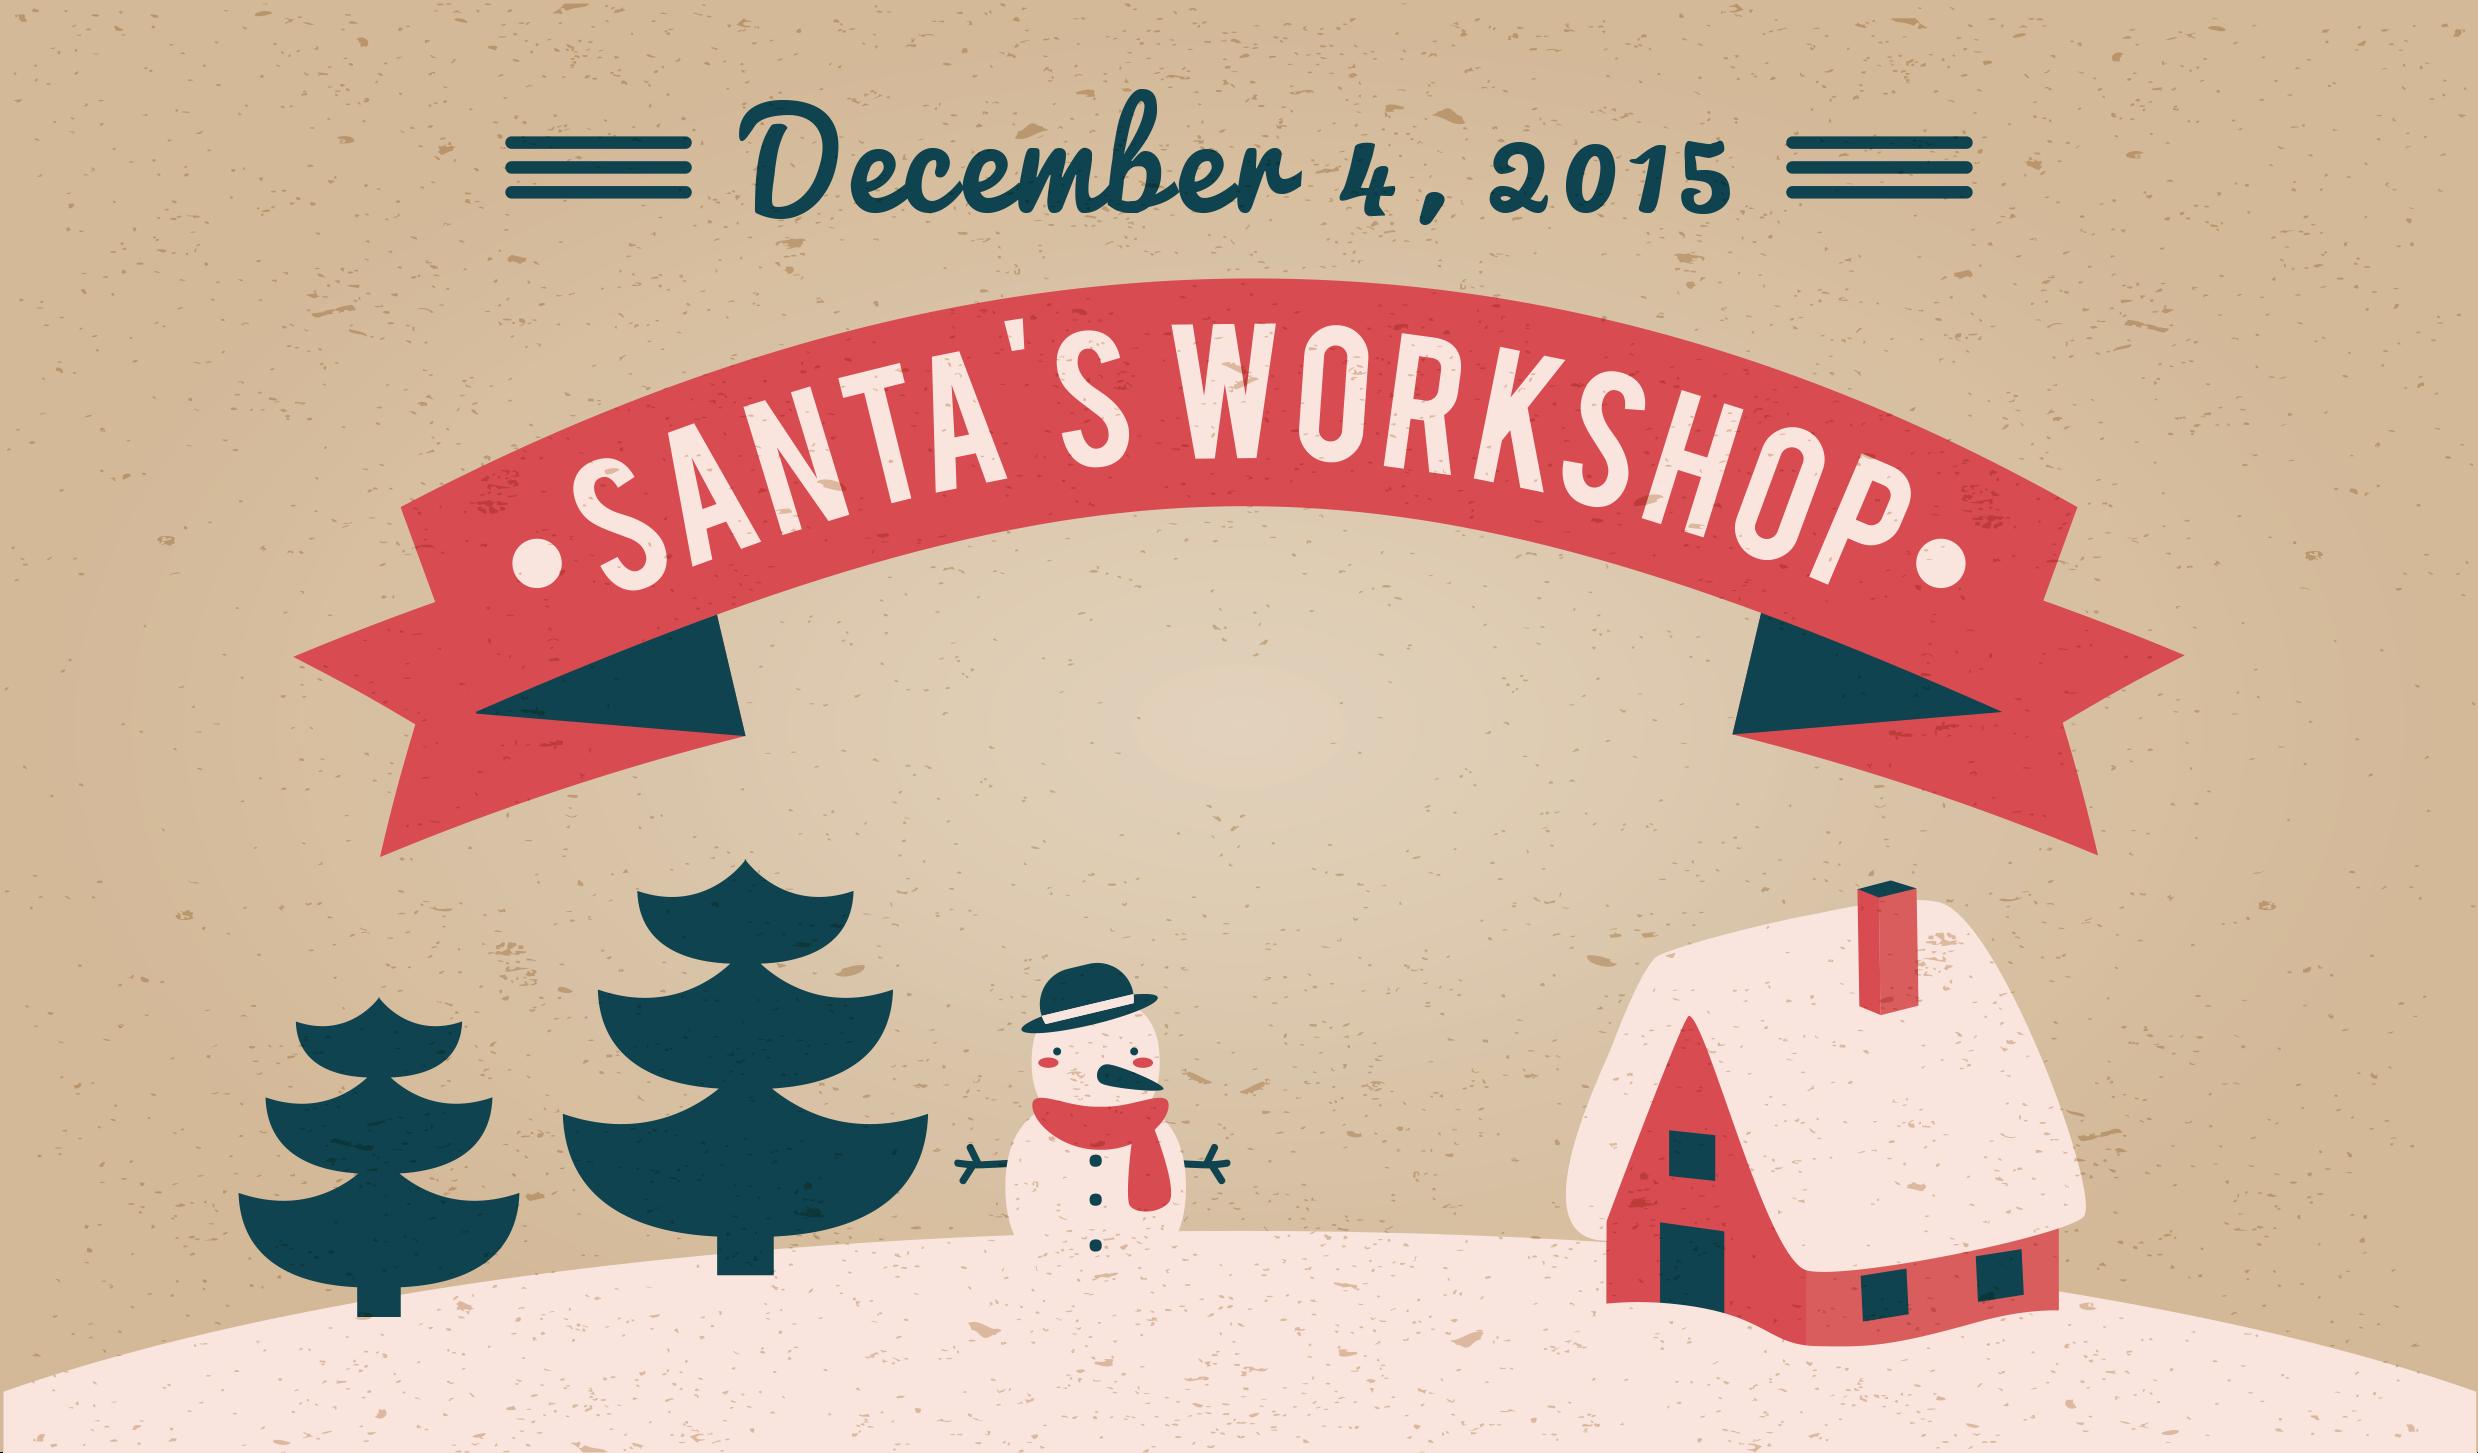 Santa's Workshop 2015